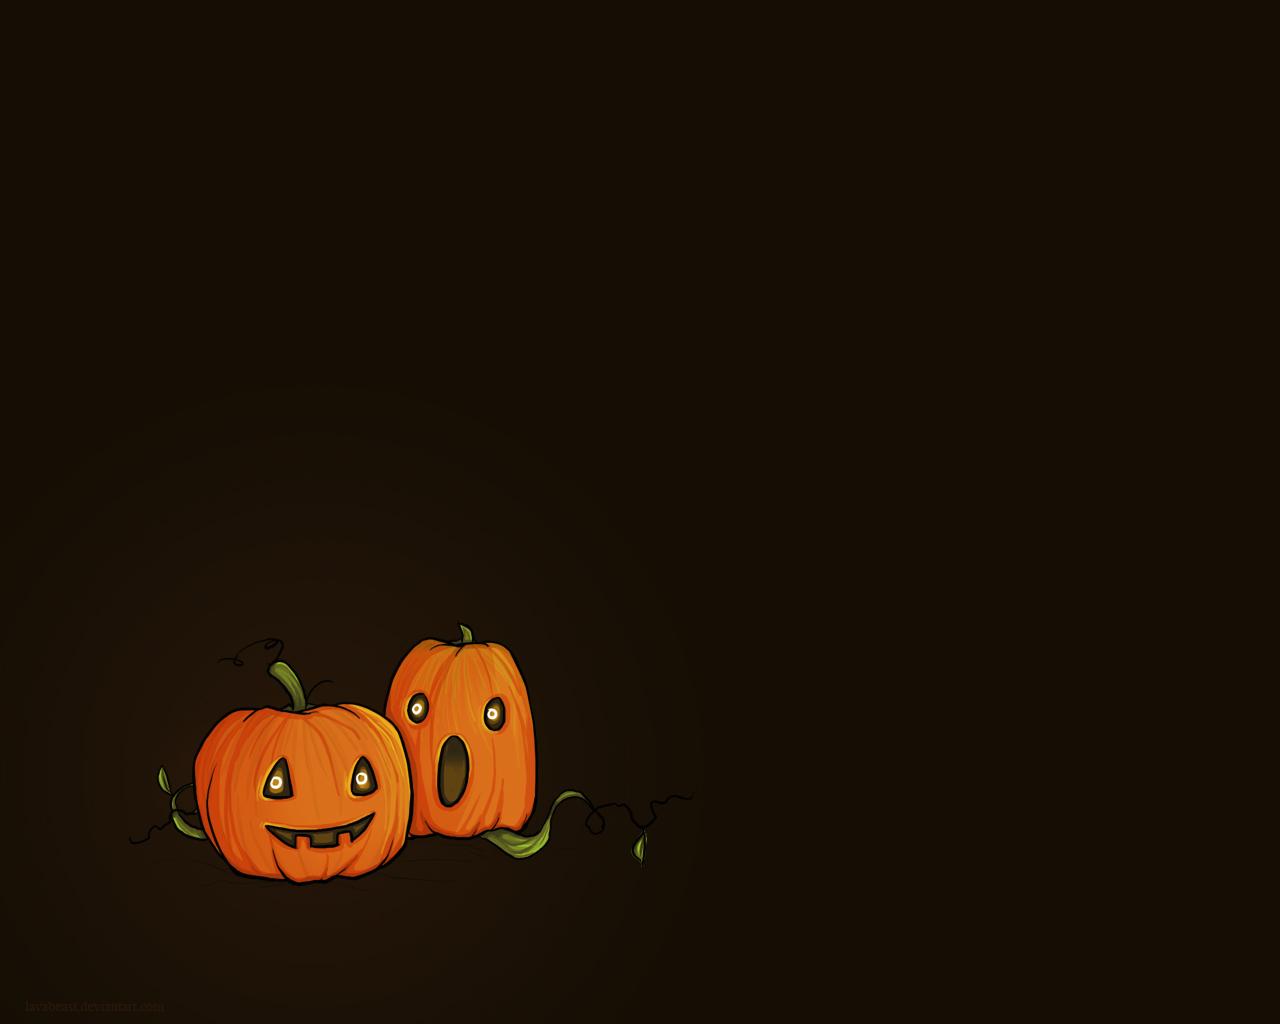 Cute Halloween Backgrounds - WallpaperSafari